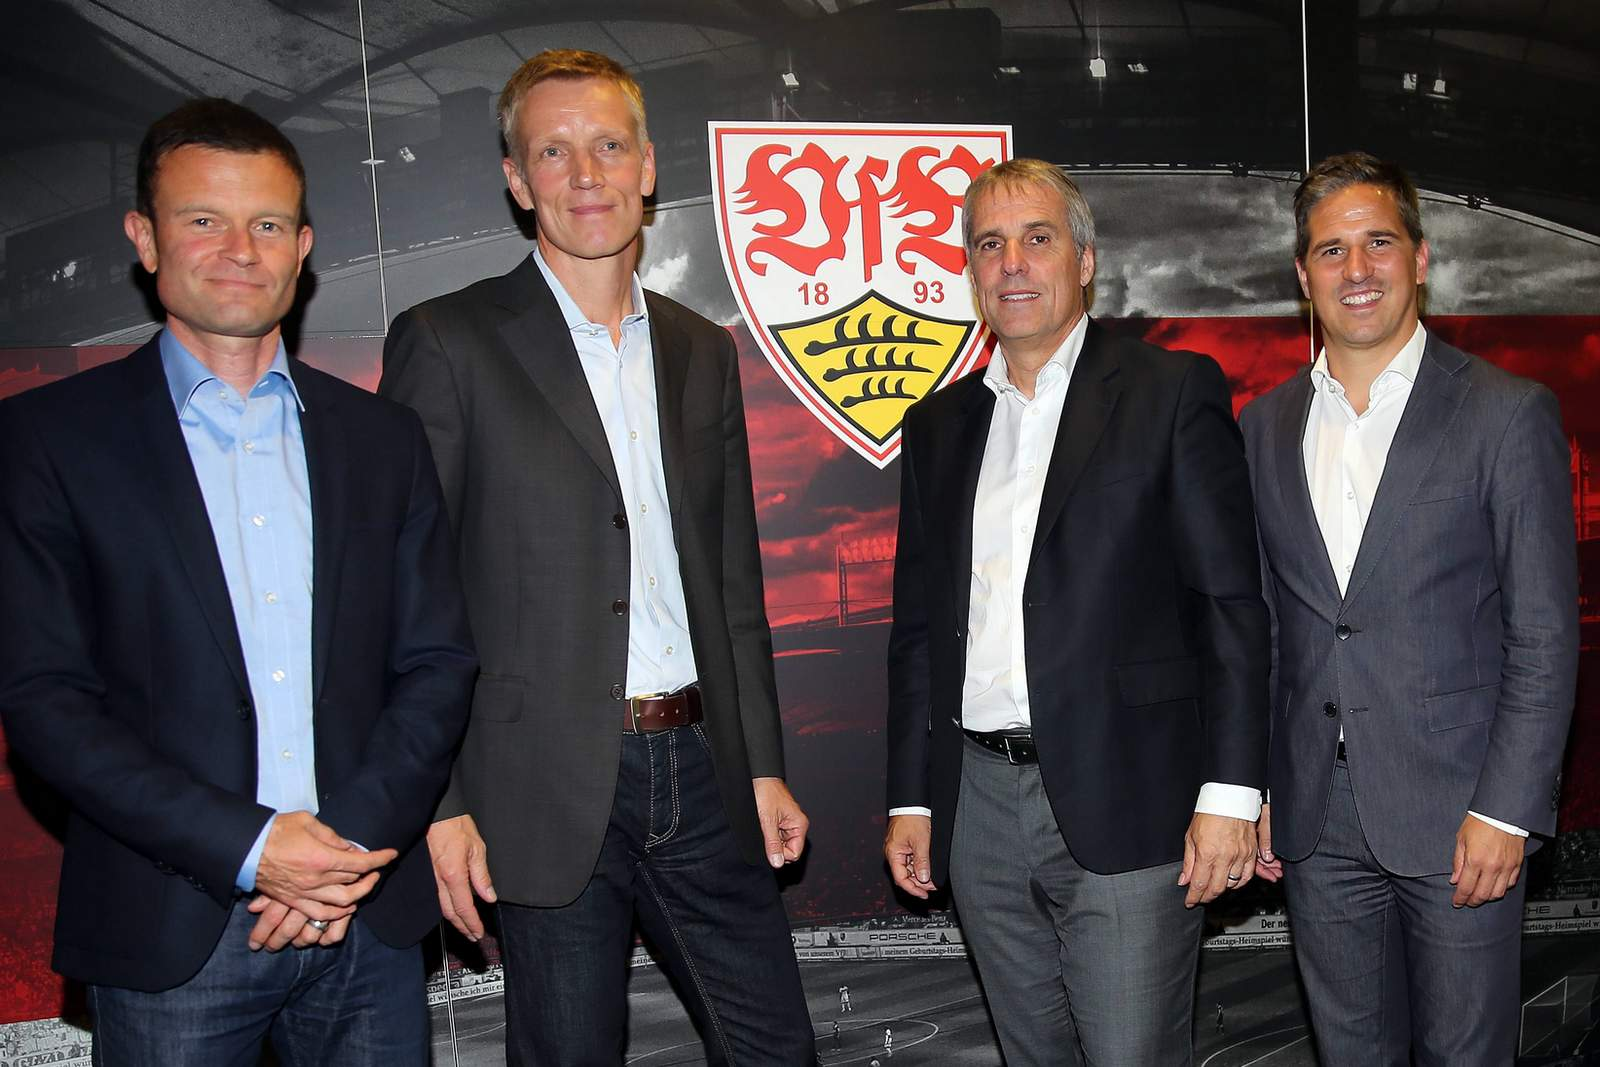 VfB Stuttgart Führung